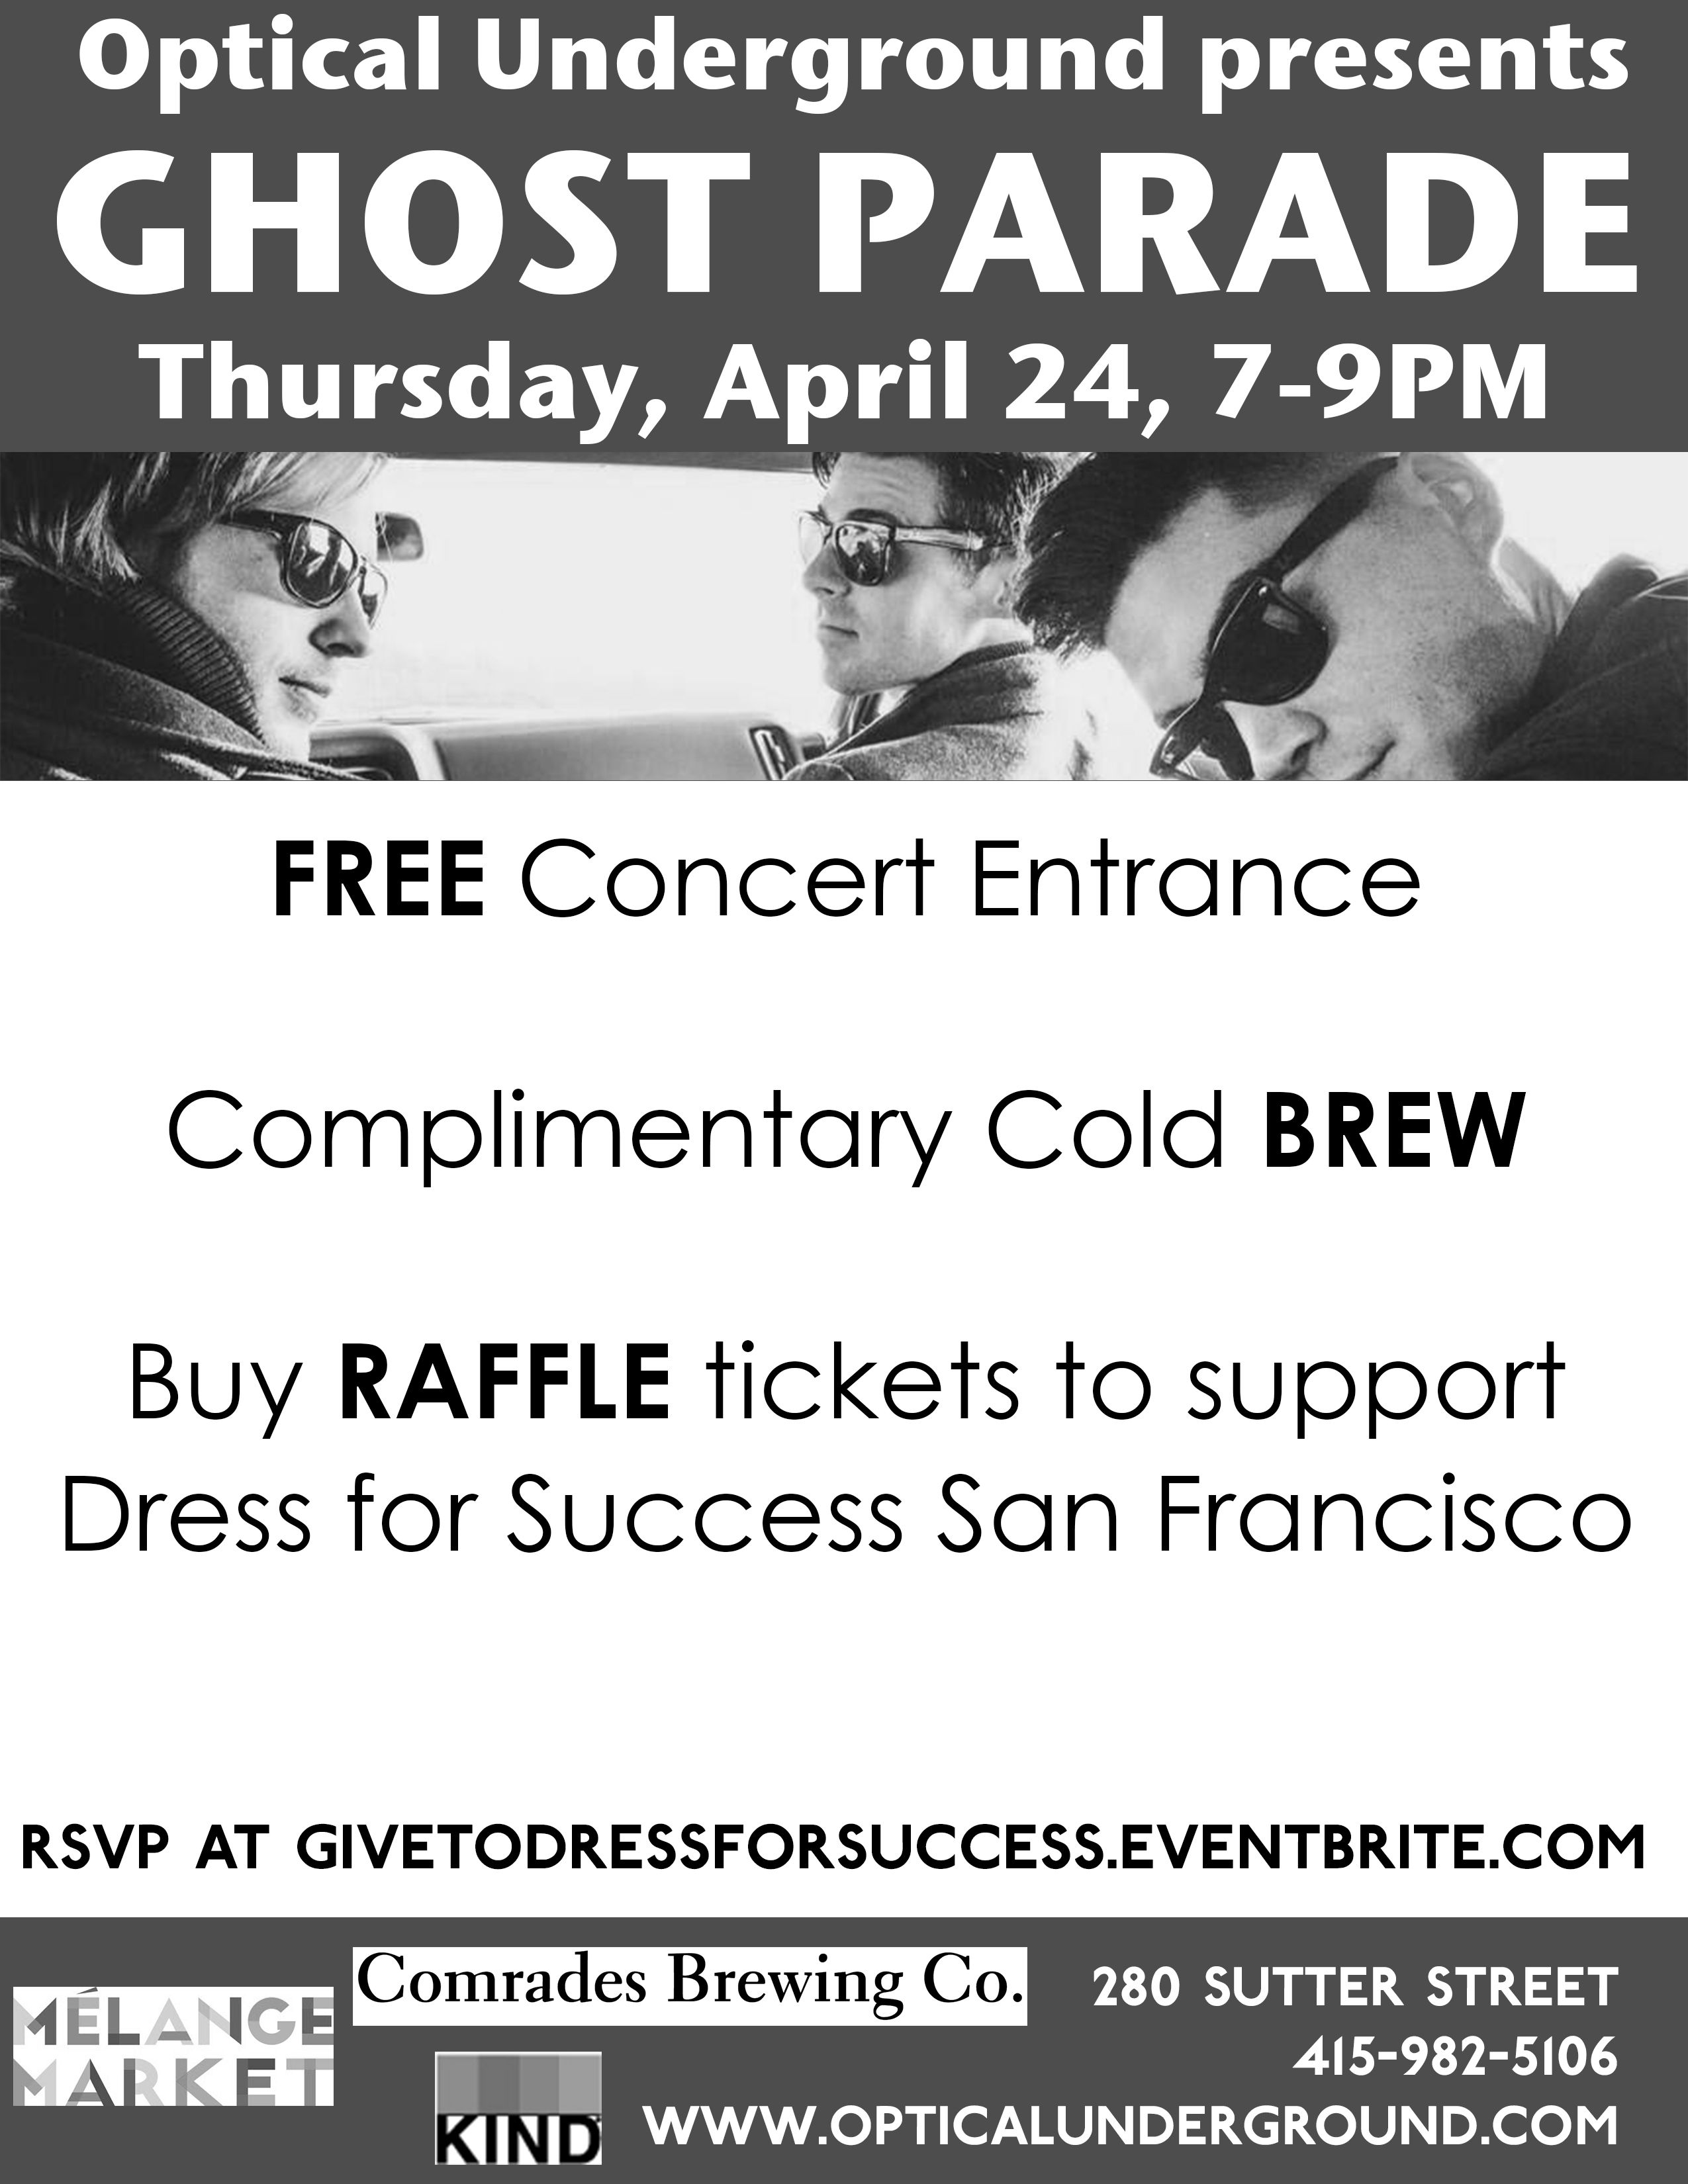 Concert Flier for Dress for Success, San Francisco: http://www.dressforsuccess.org/affiliate.aspx?sisid=114&pageid=1